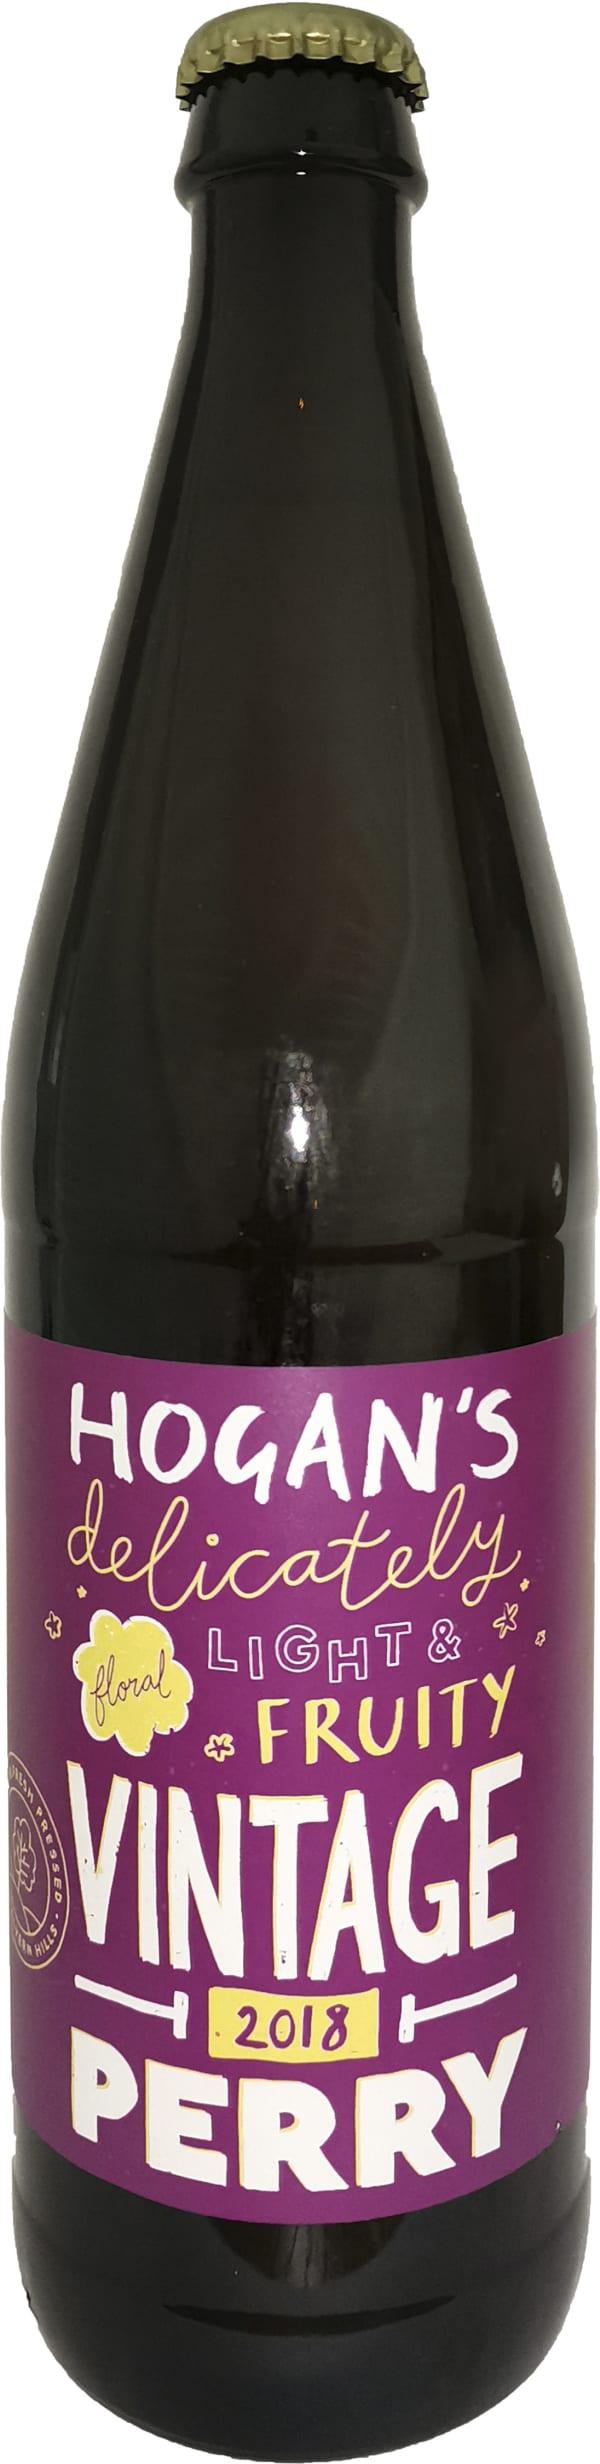 Hogan's Vintage Perry 2018